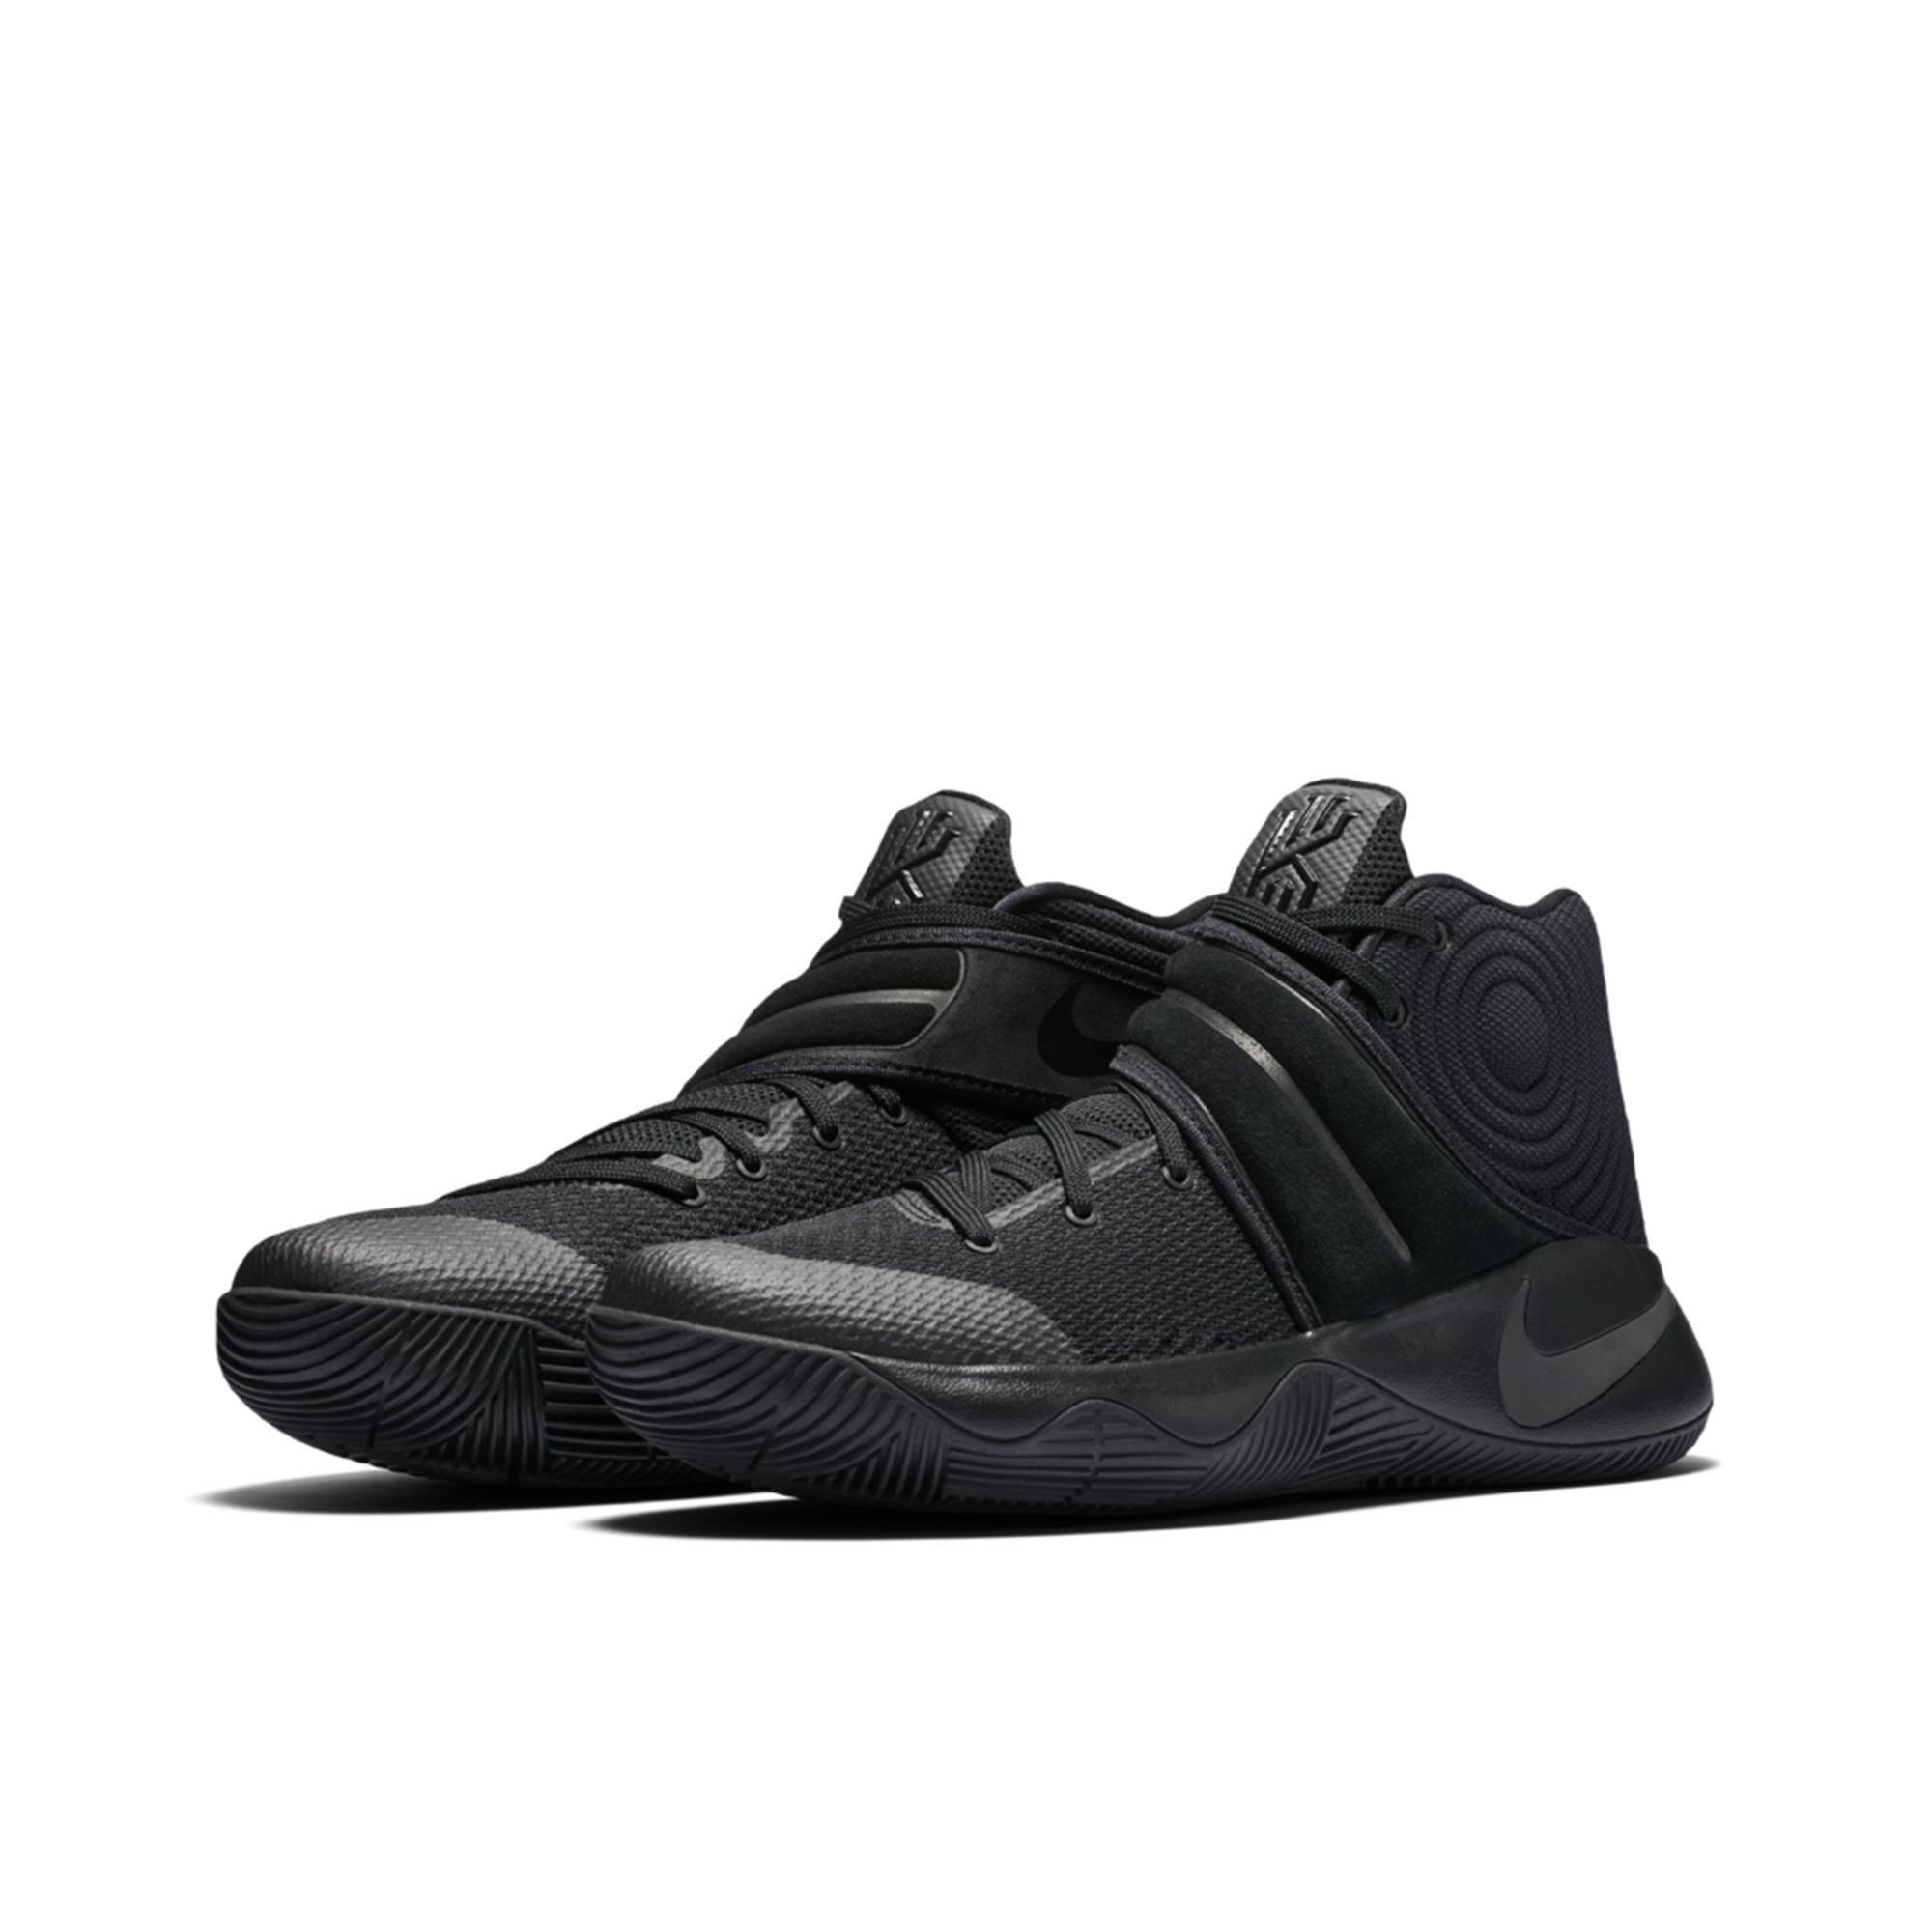 7a89a3a05b4 Tênis Nike Kyrie 2 Masculino